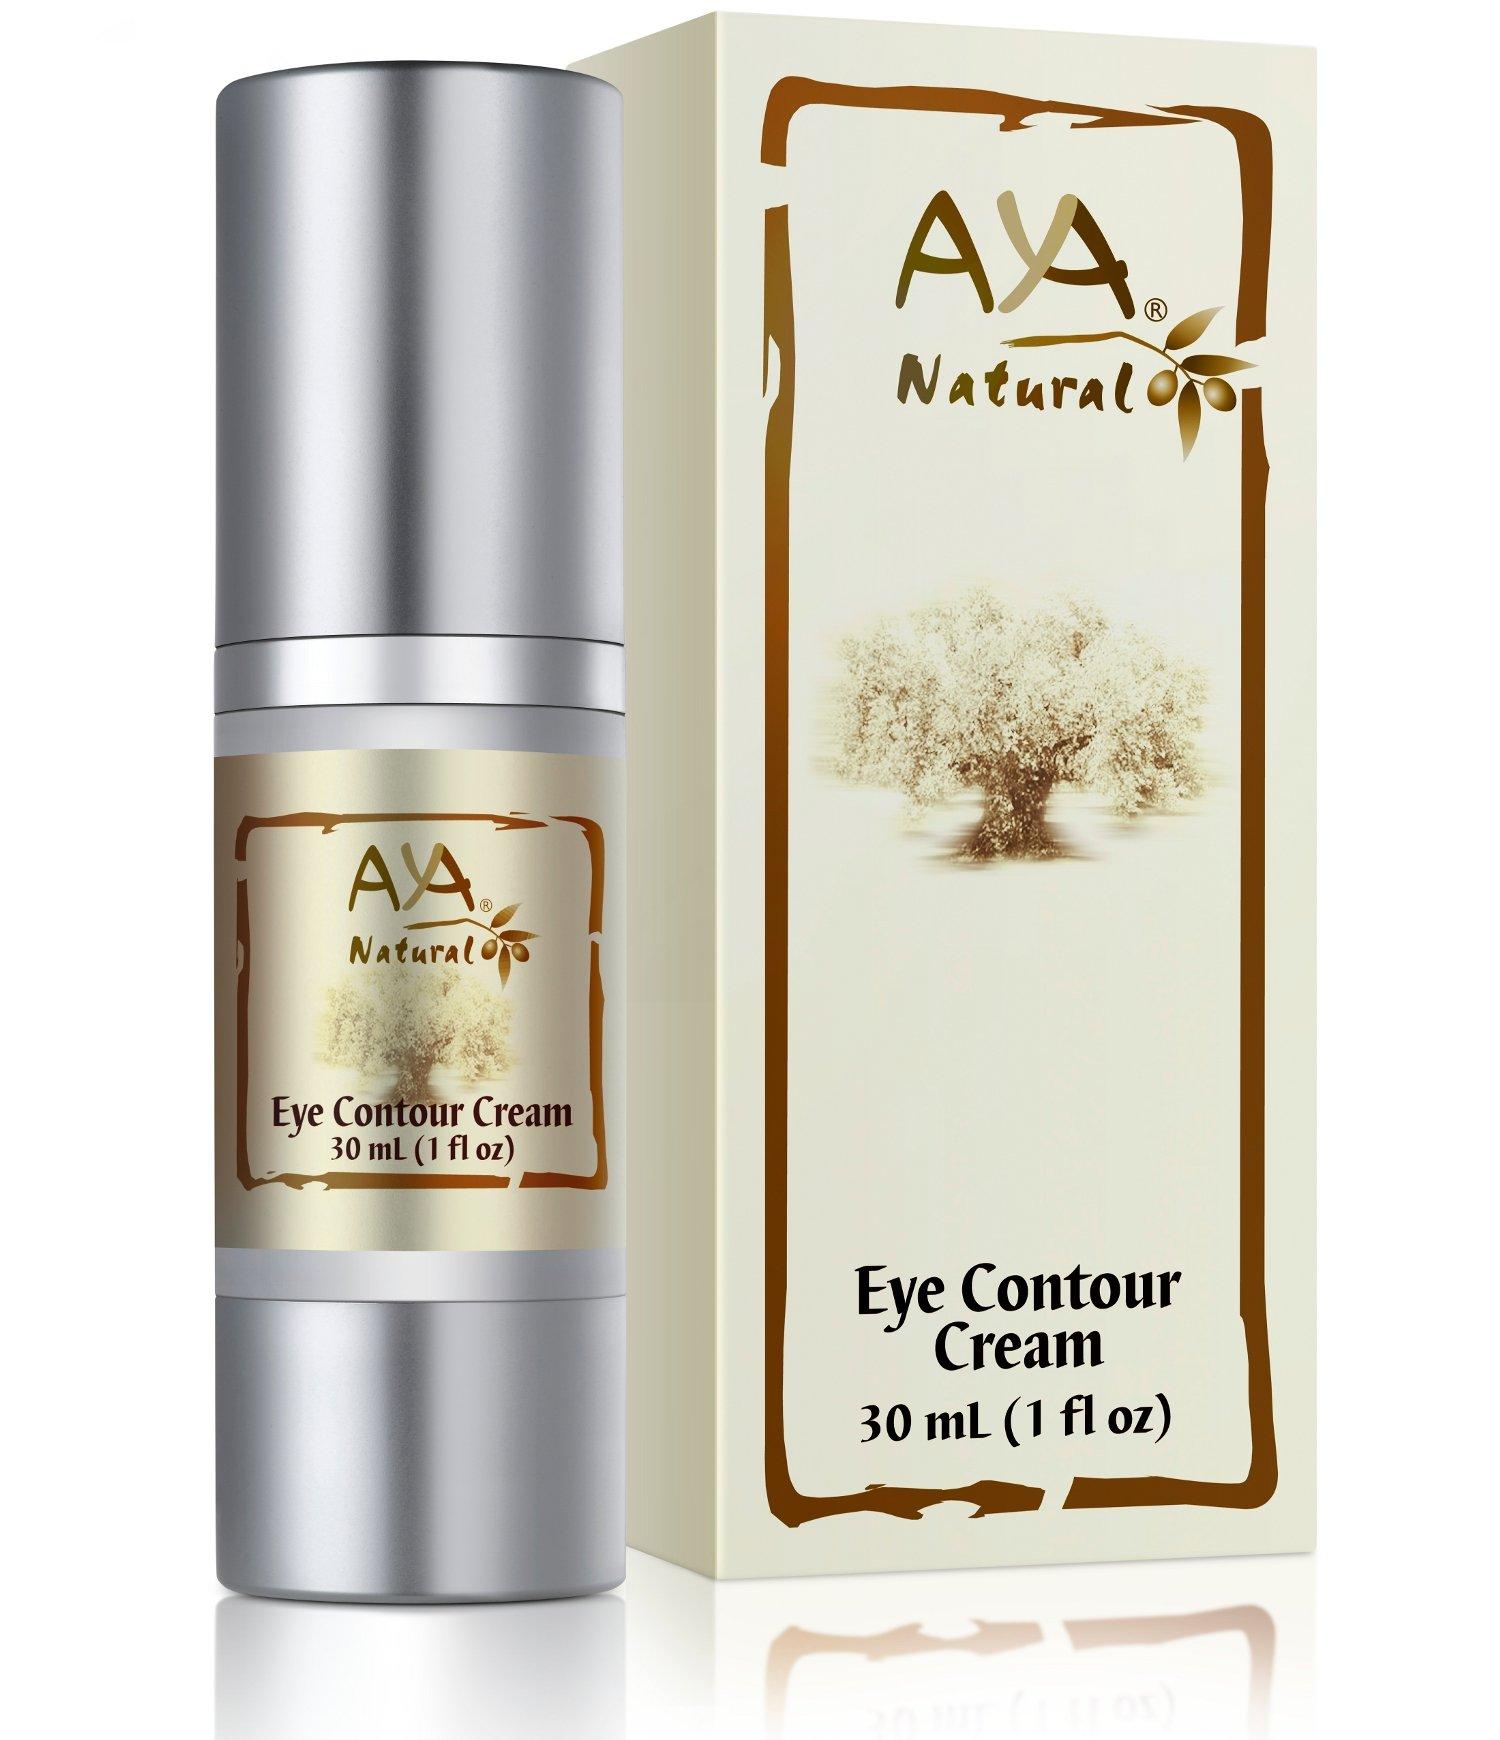 100% Natural Eye Cream for Dark Circles - Premium Vegan Contour Undereye Creme - Shea, Jojoba, Olive, Almond, Rosemary and Avocado Oils Blend